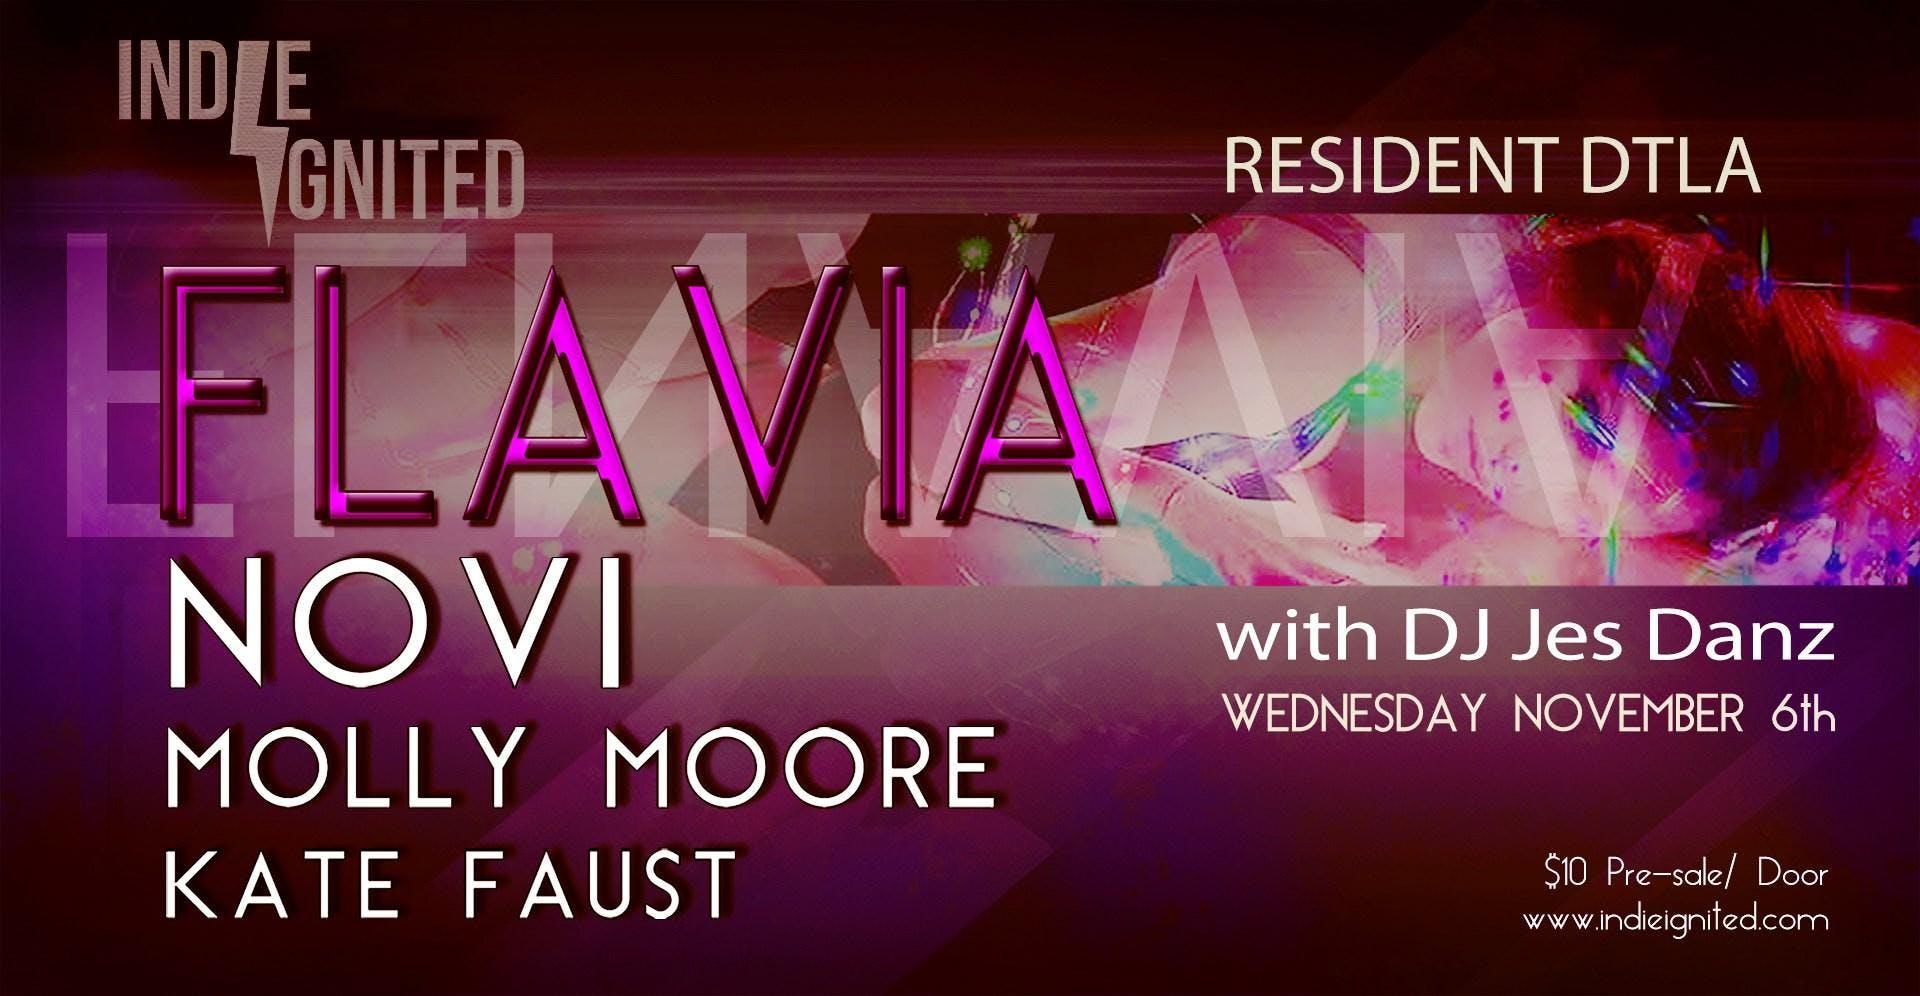 Flavia + Novi, Molly Moore, Kate Faust | Indie Ignited